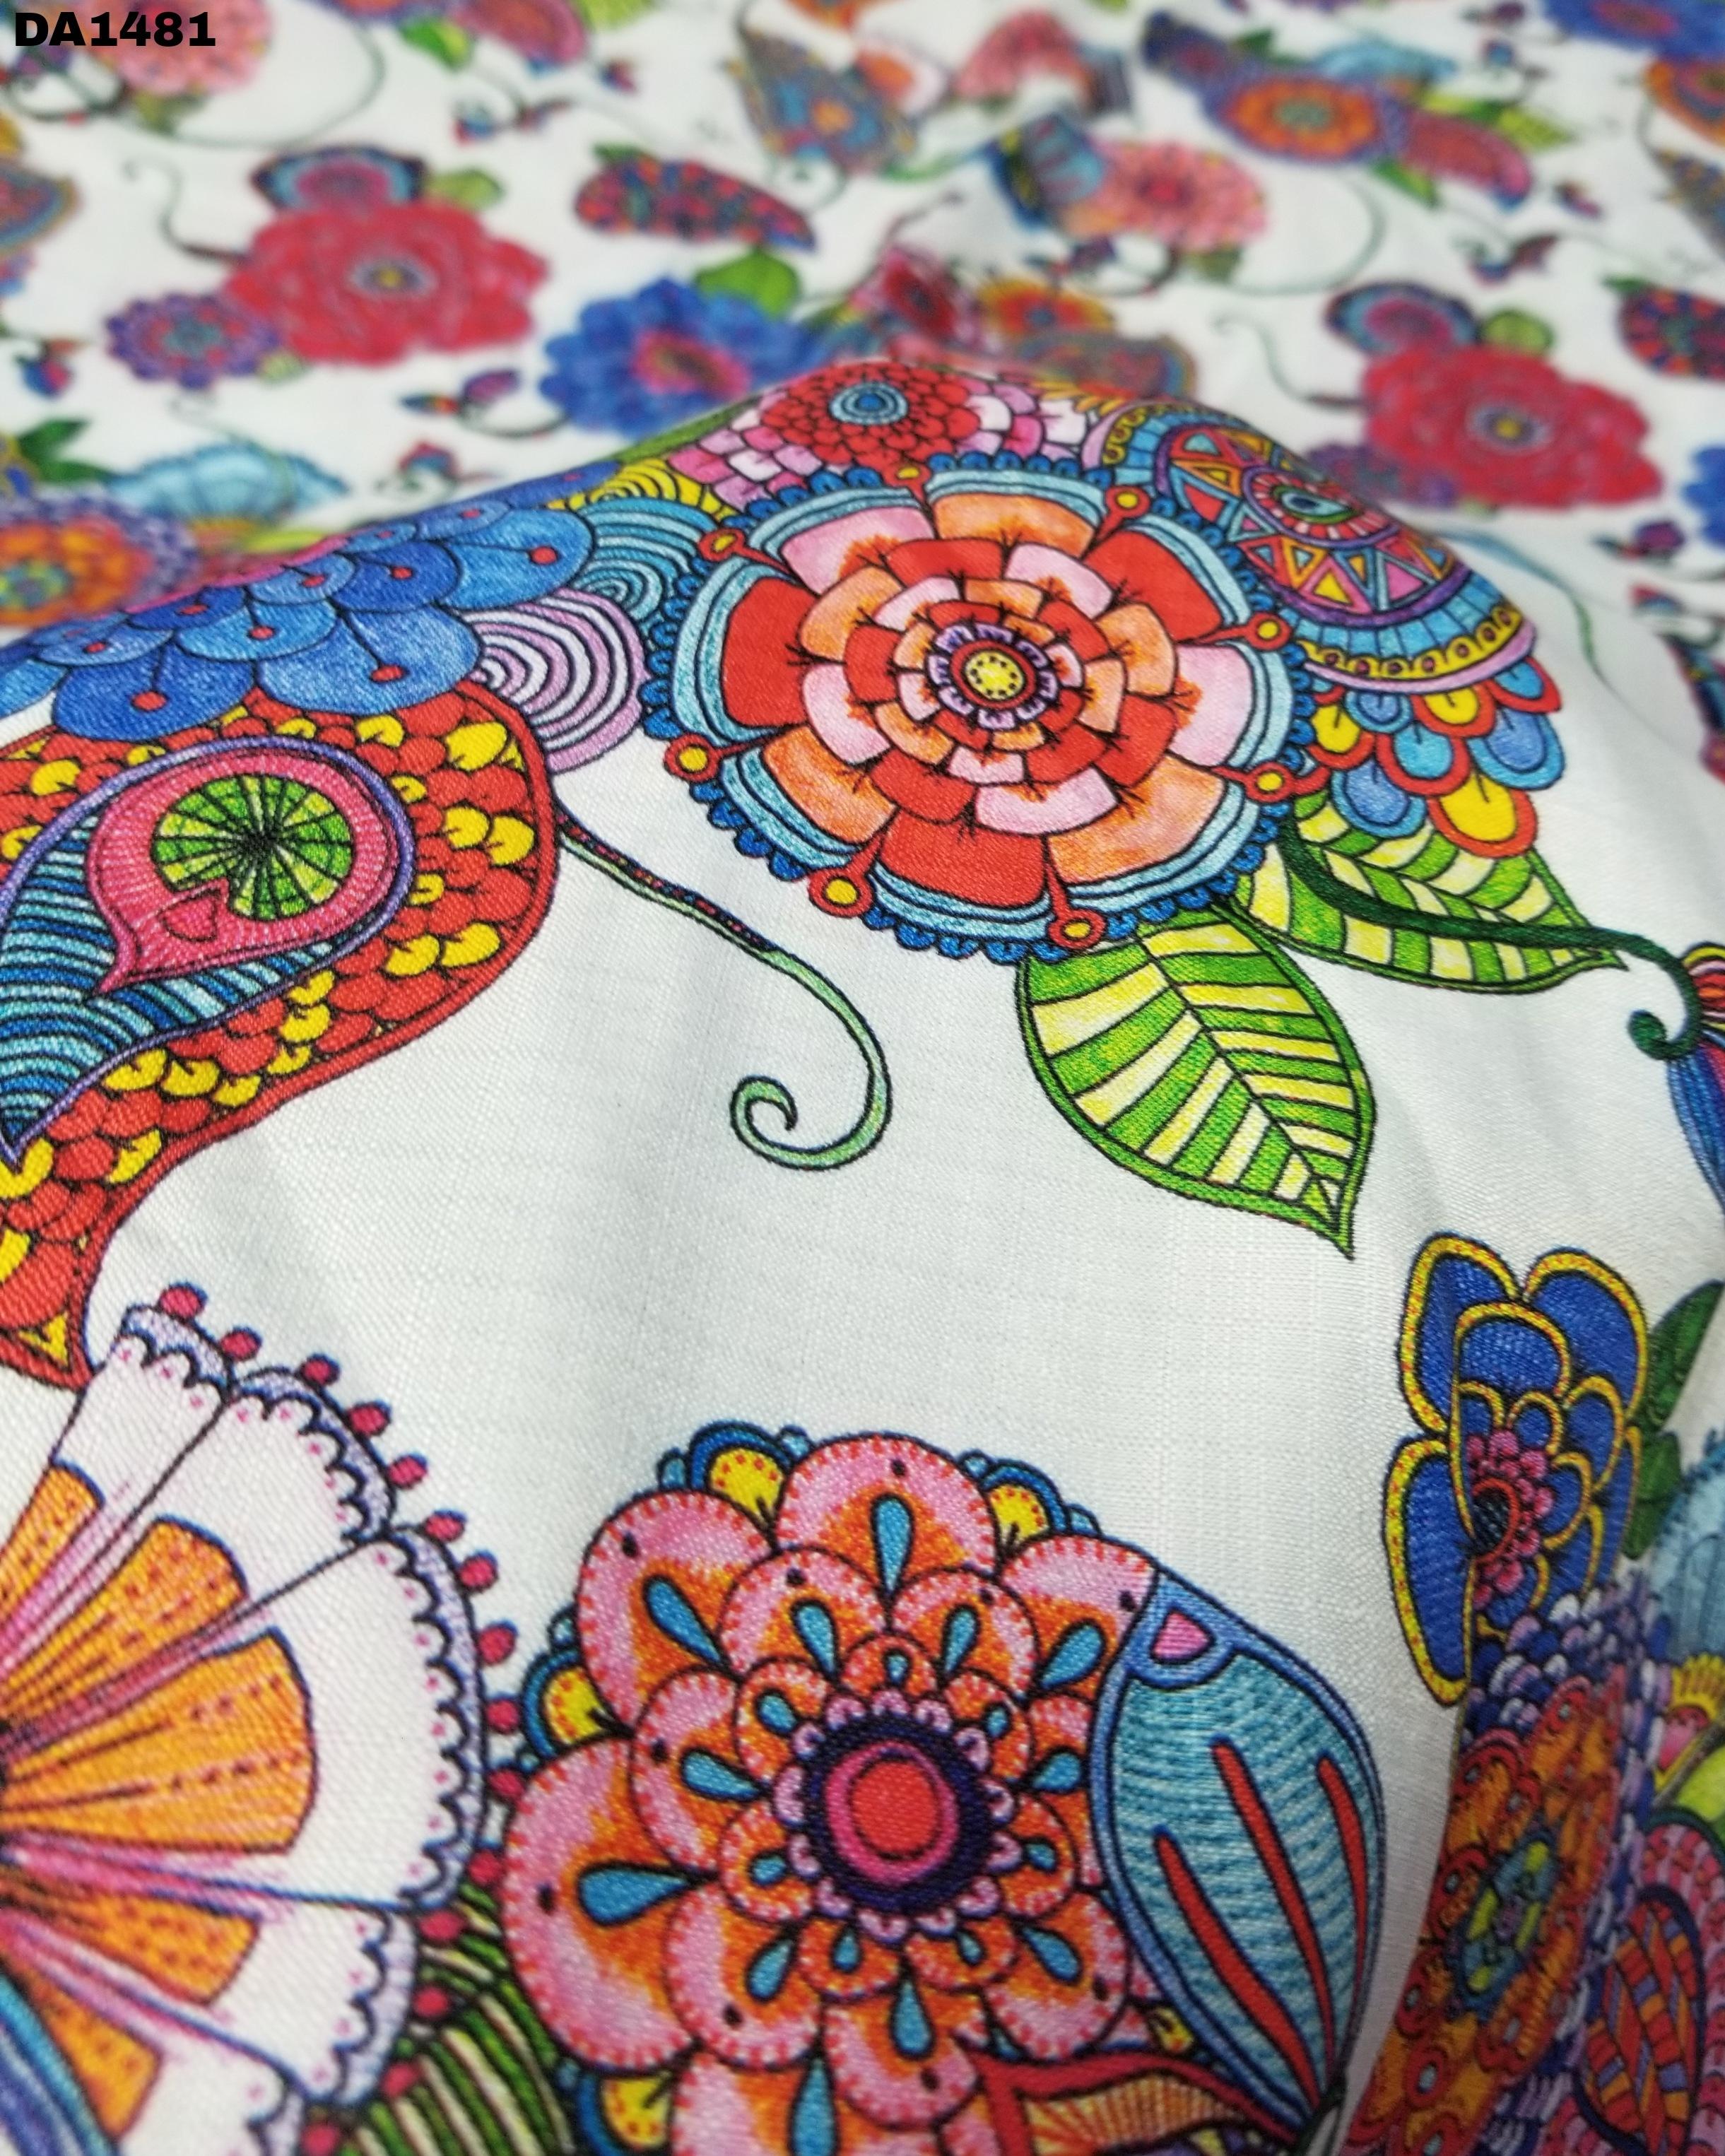 Stunning Big Width Digital Prints on Linen Fabric